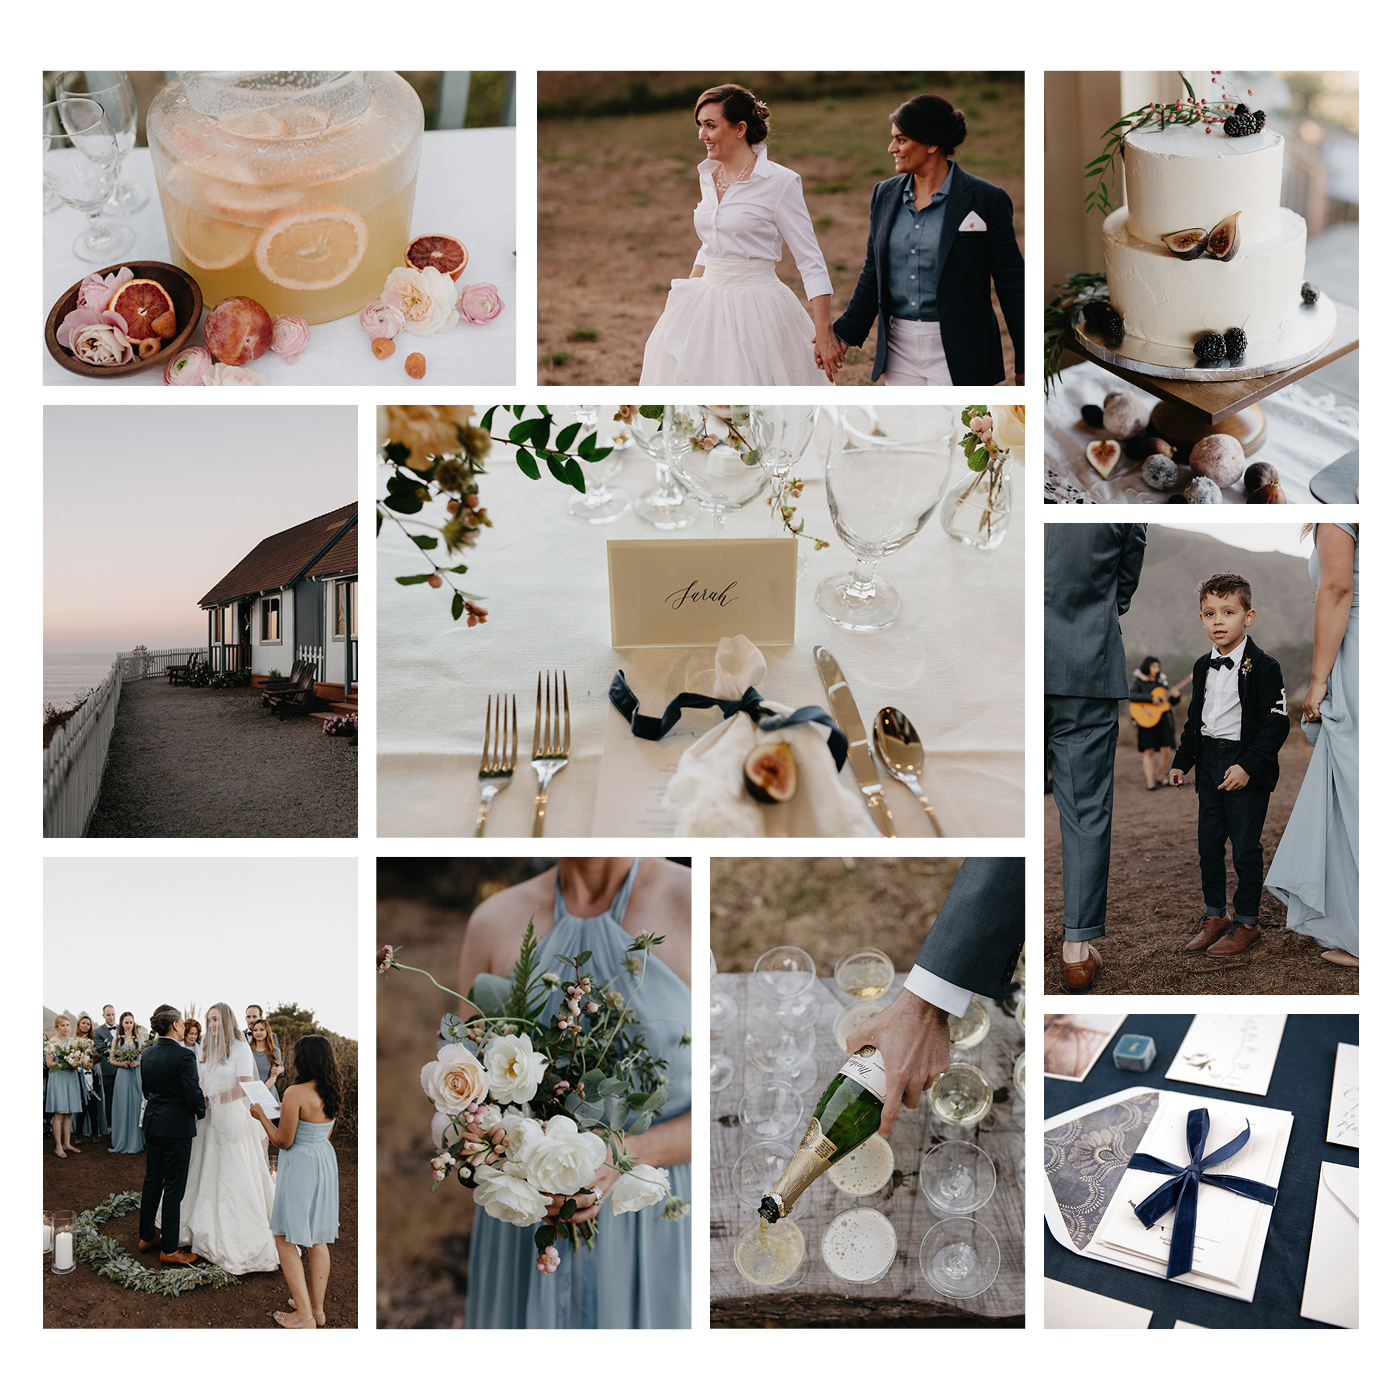 Credits:  Nirav Patel,   Harvesting Love Events ,  Max Cutrone ,  Kipper Clothiers ,  Lambert Floral Studio ,  Kelly Hamilton ,  La Tavola ,  Tankerville Press ,  Olive Branch and Co.